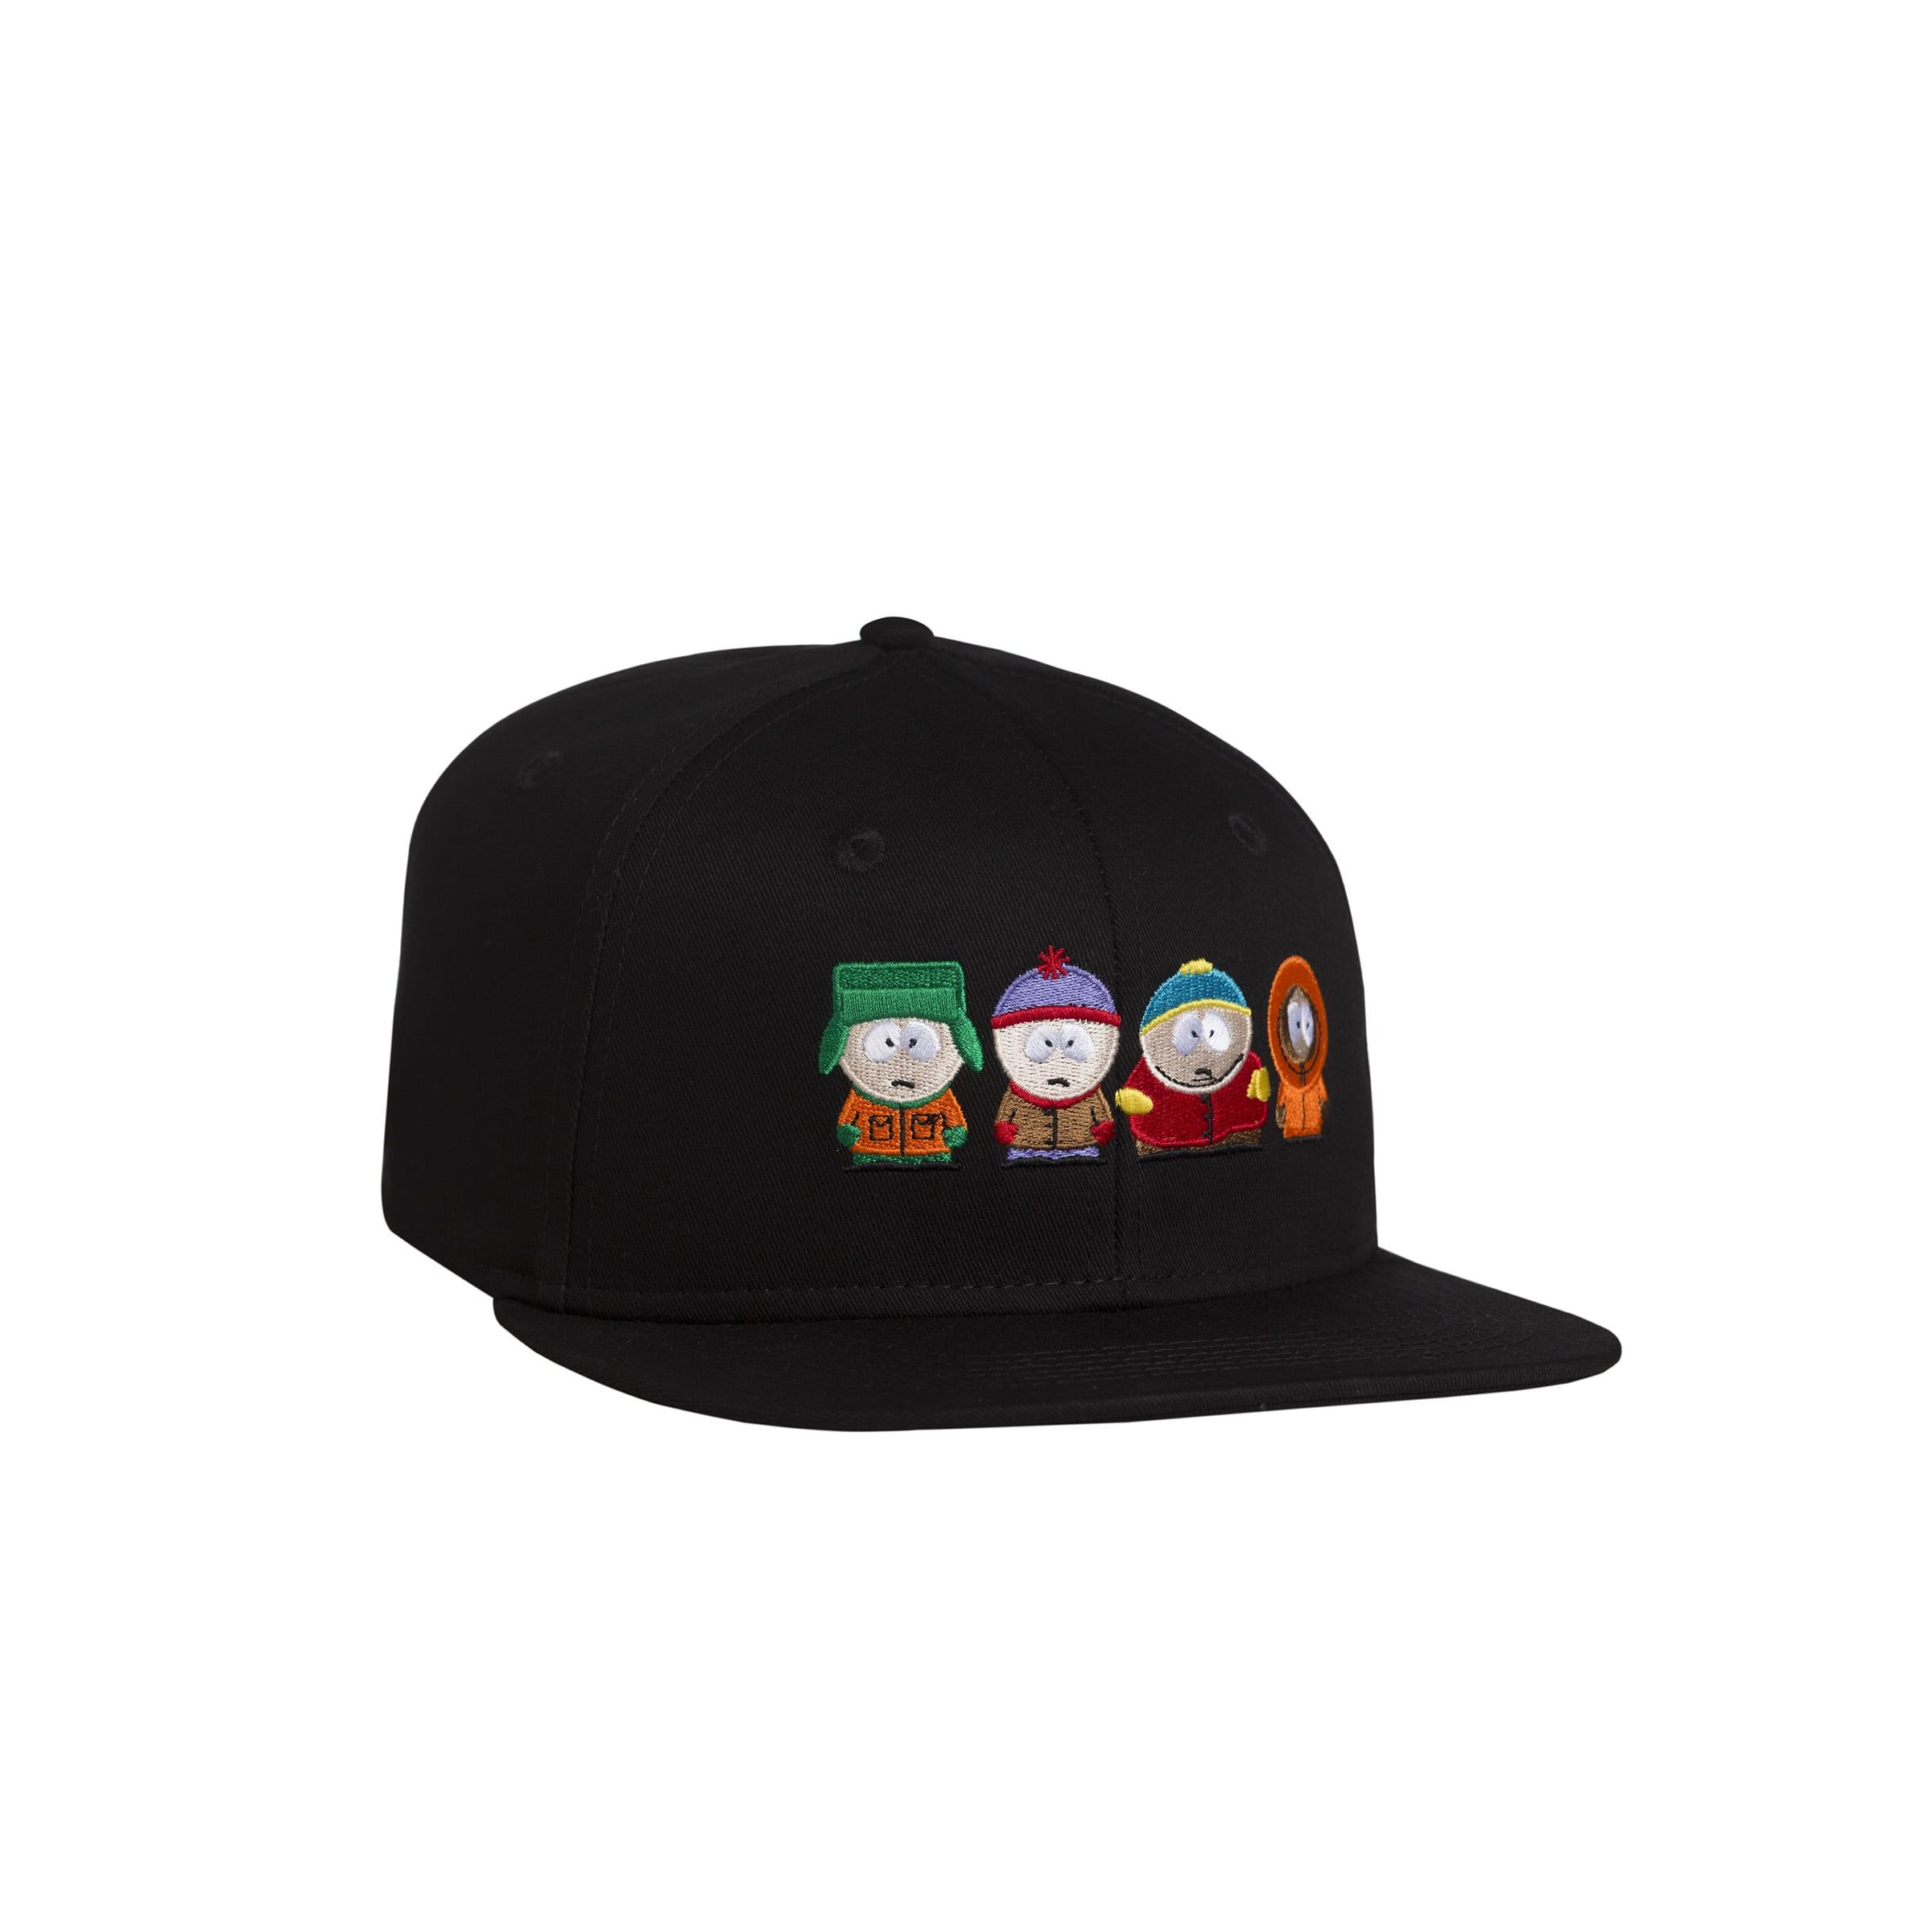 Czapka HUF x South Park Kids Strapback Black